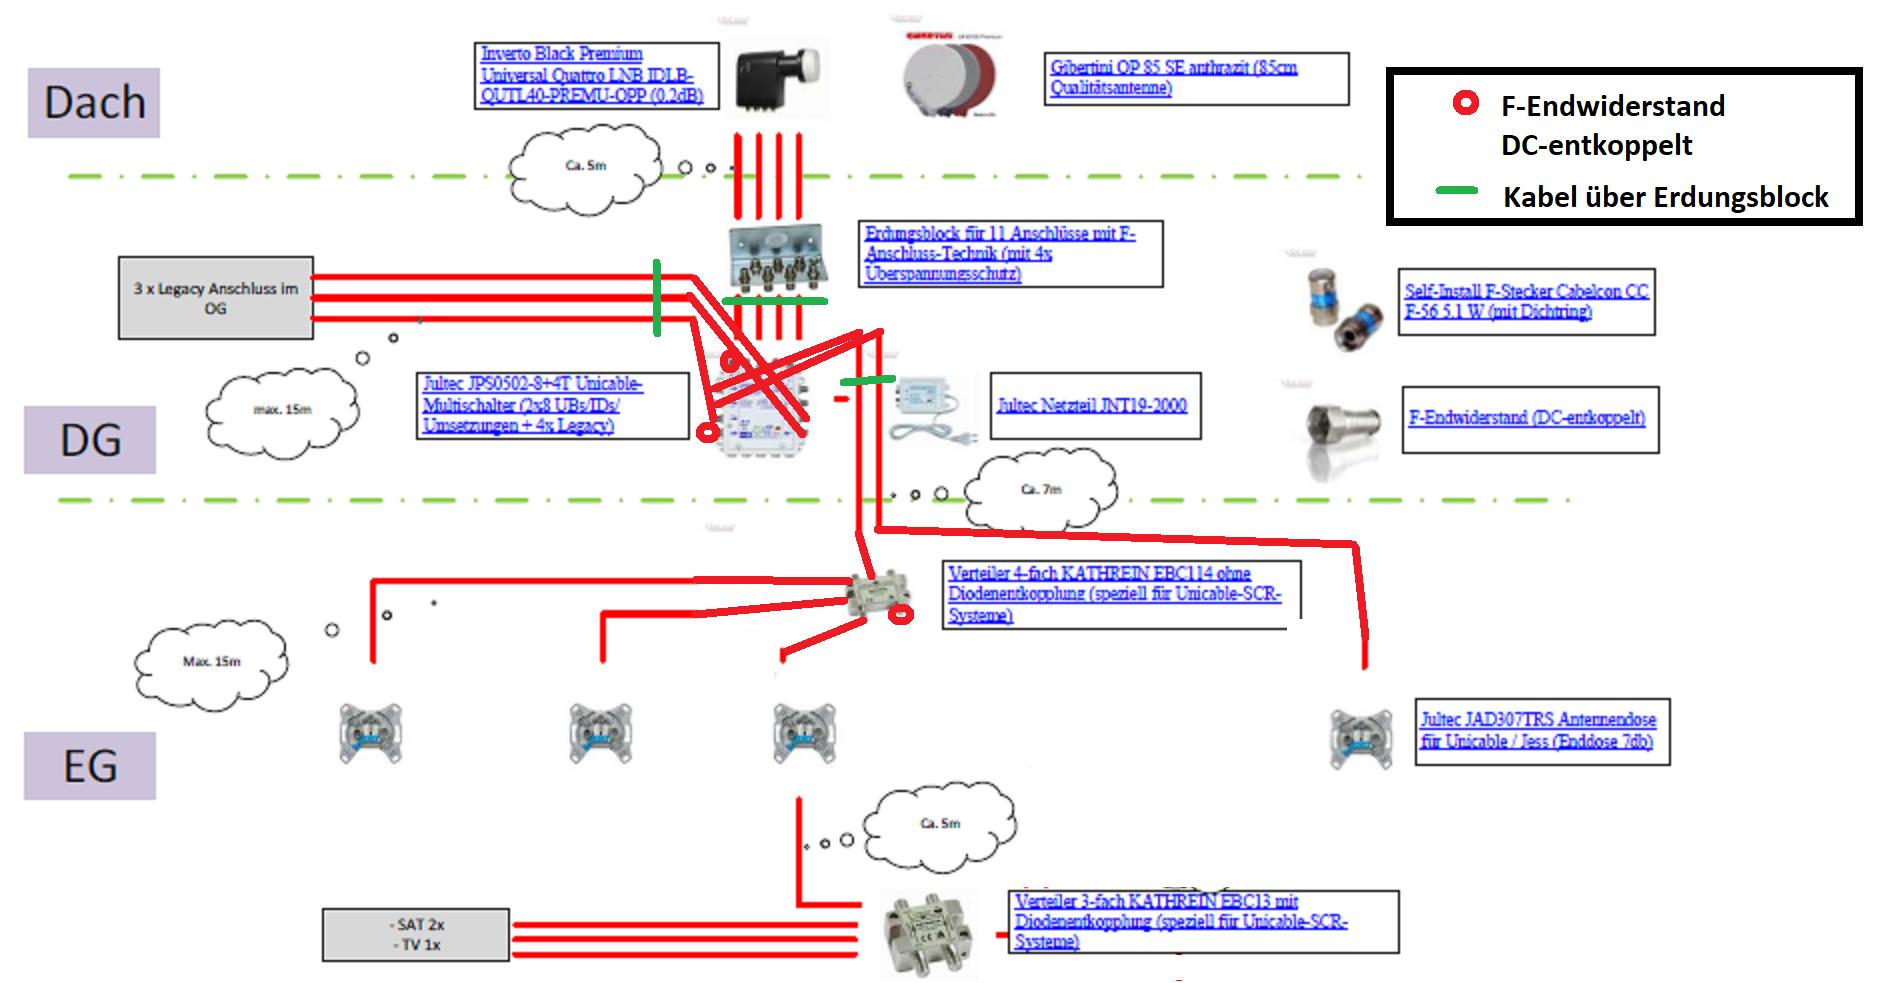 JultecJPS0502-8+4T_Unicable-Anlage-Planung_Edit2_Verteiler_Potentialausgleich.png